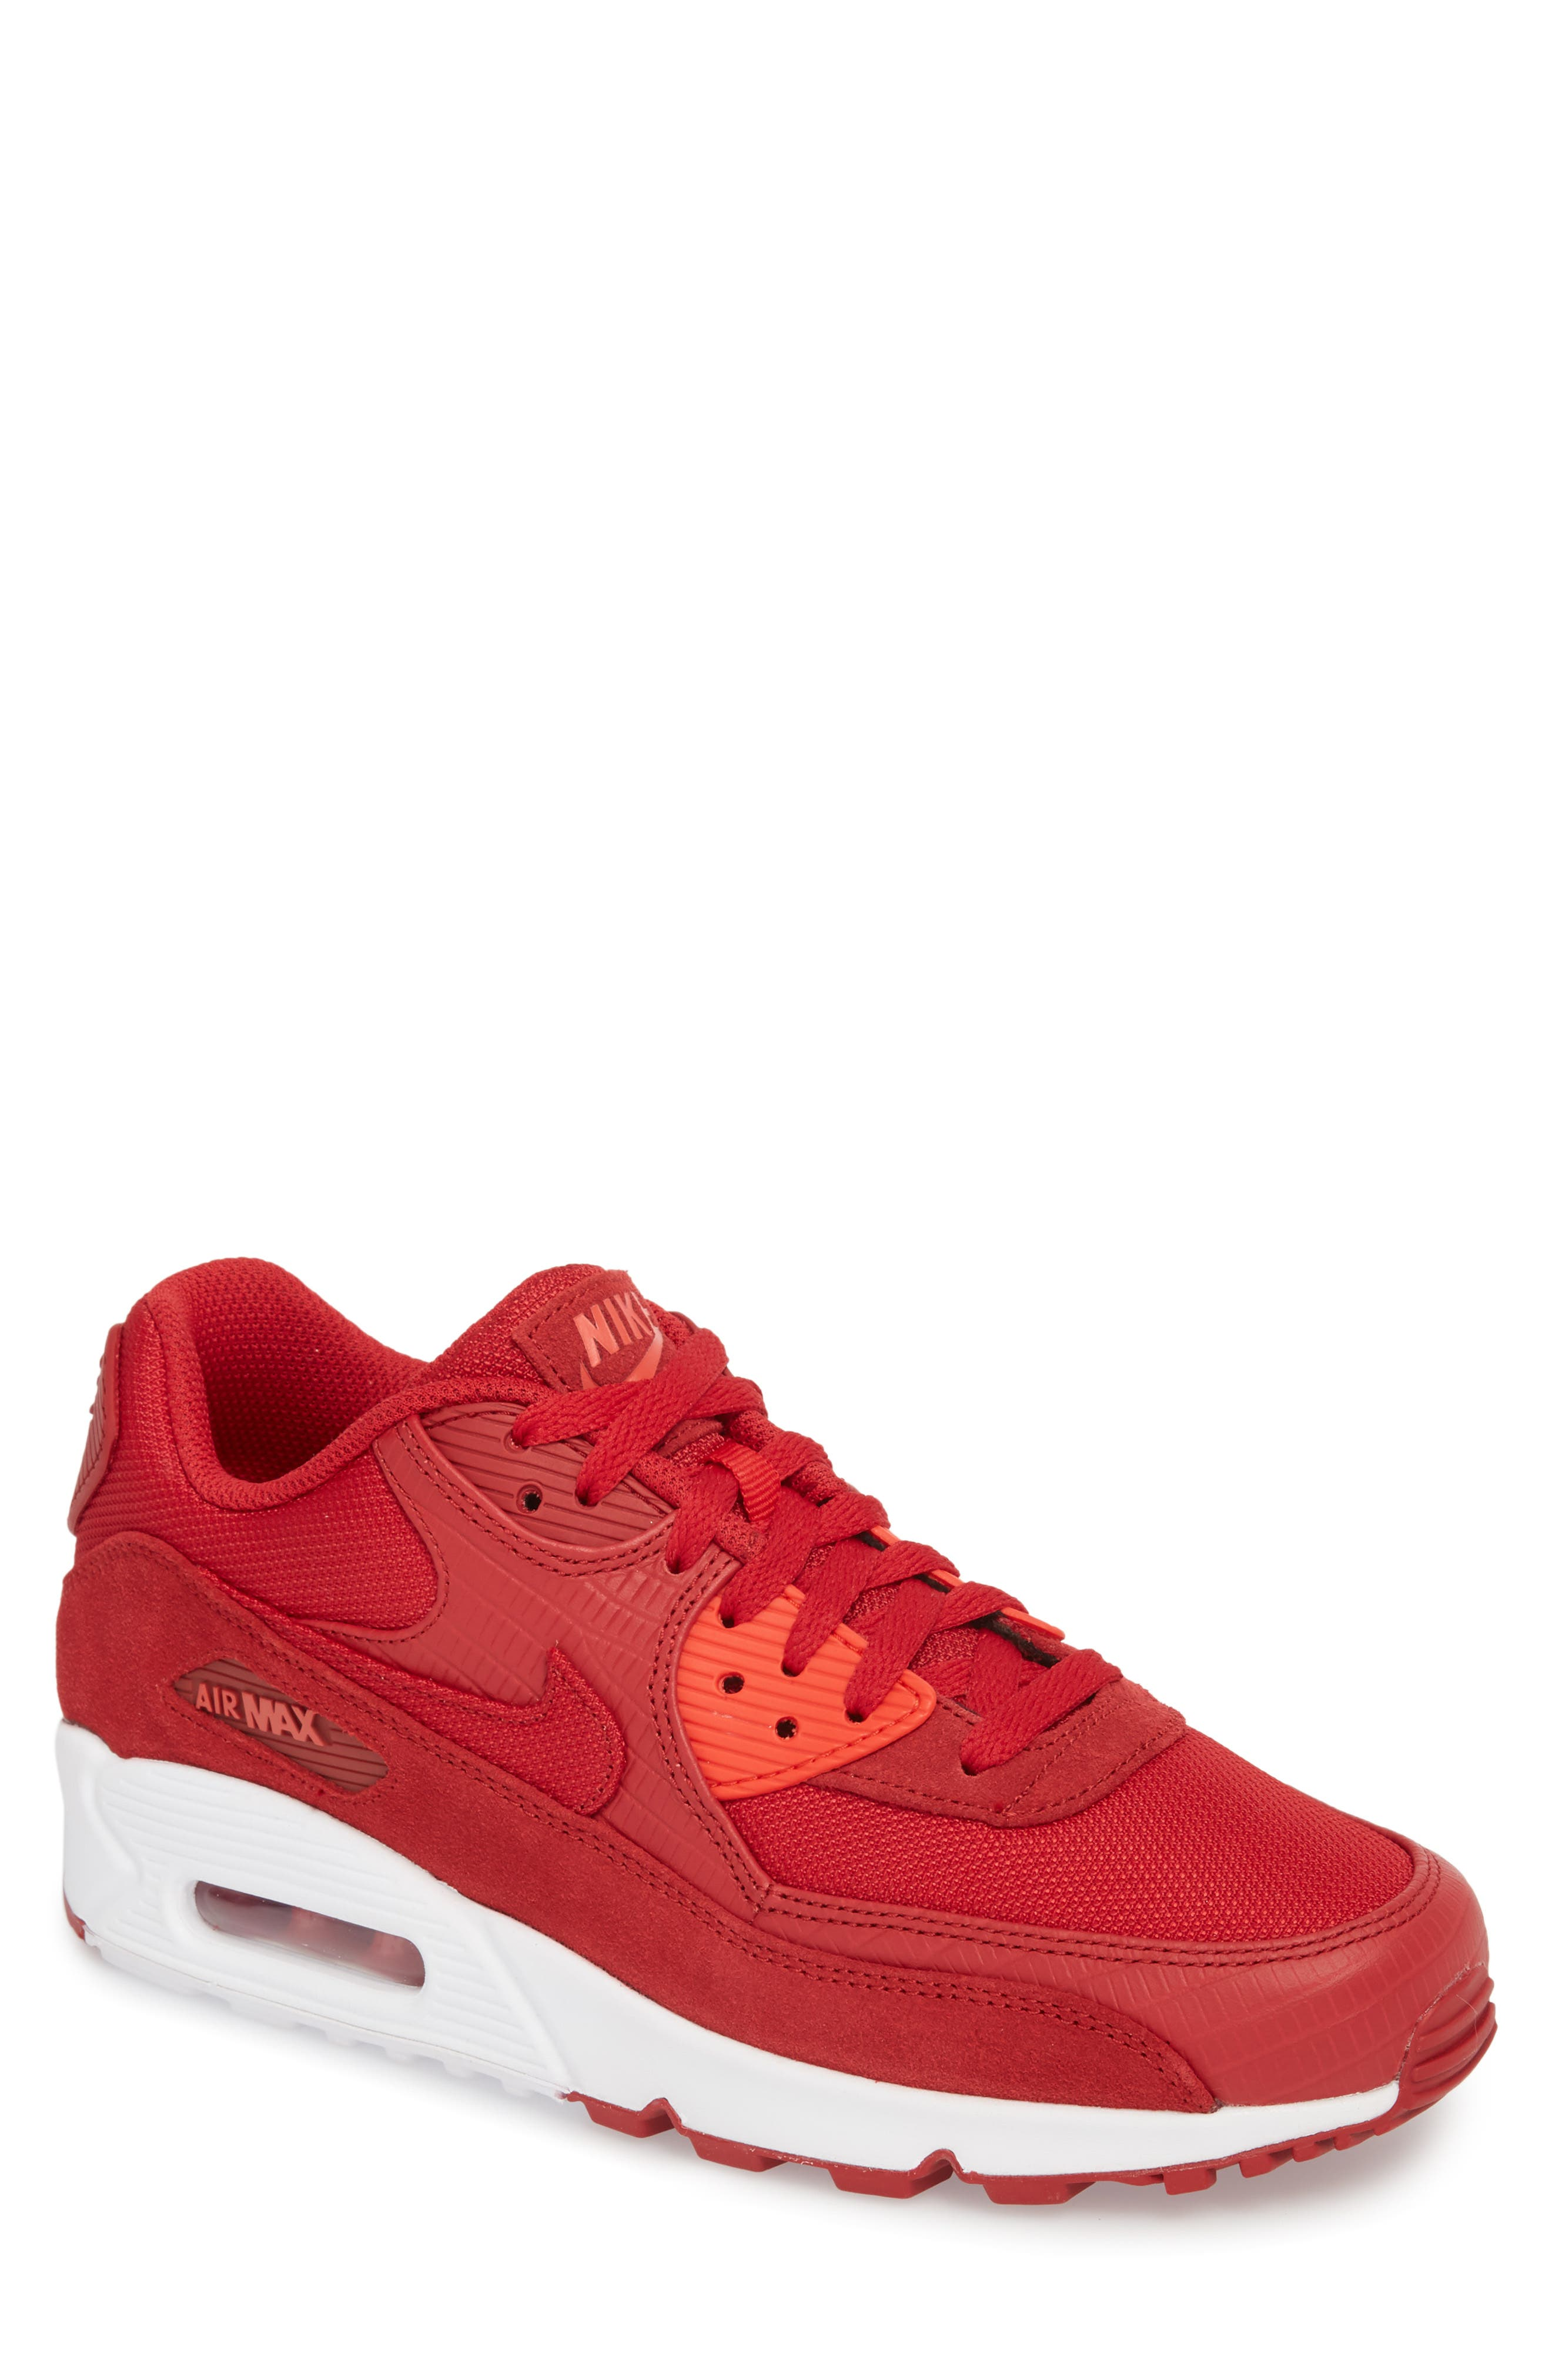 Air Max 90 Premium Sneaker,                             Main thumbnail 1, color,                             Gym Red/ White